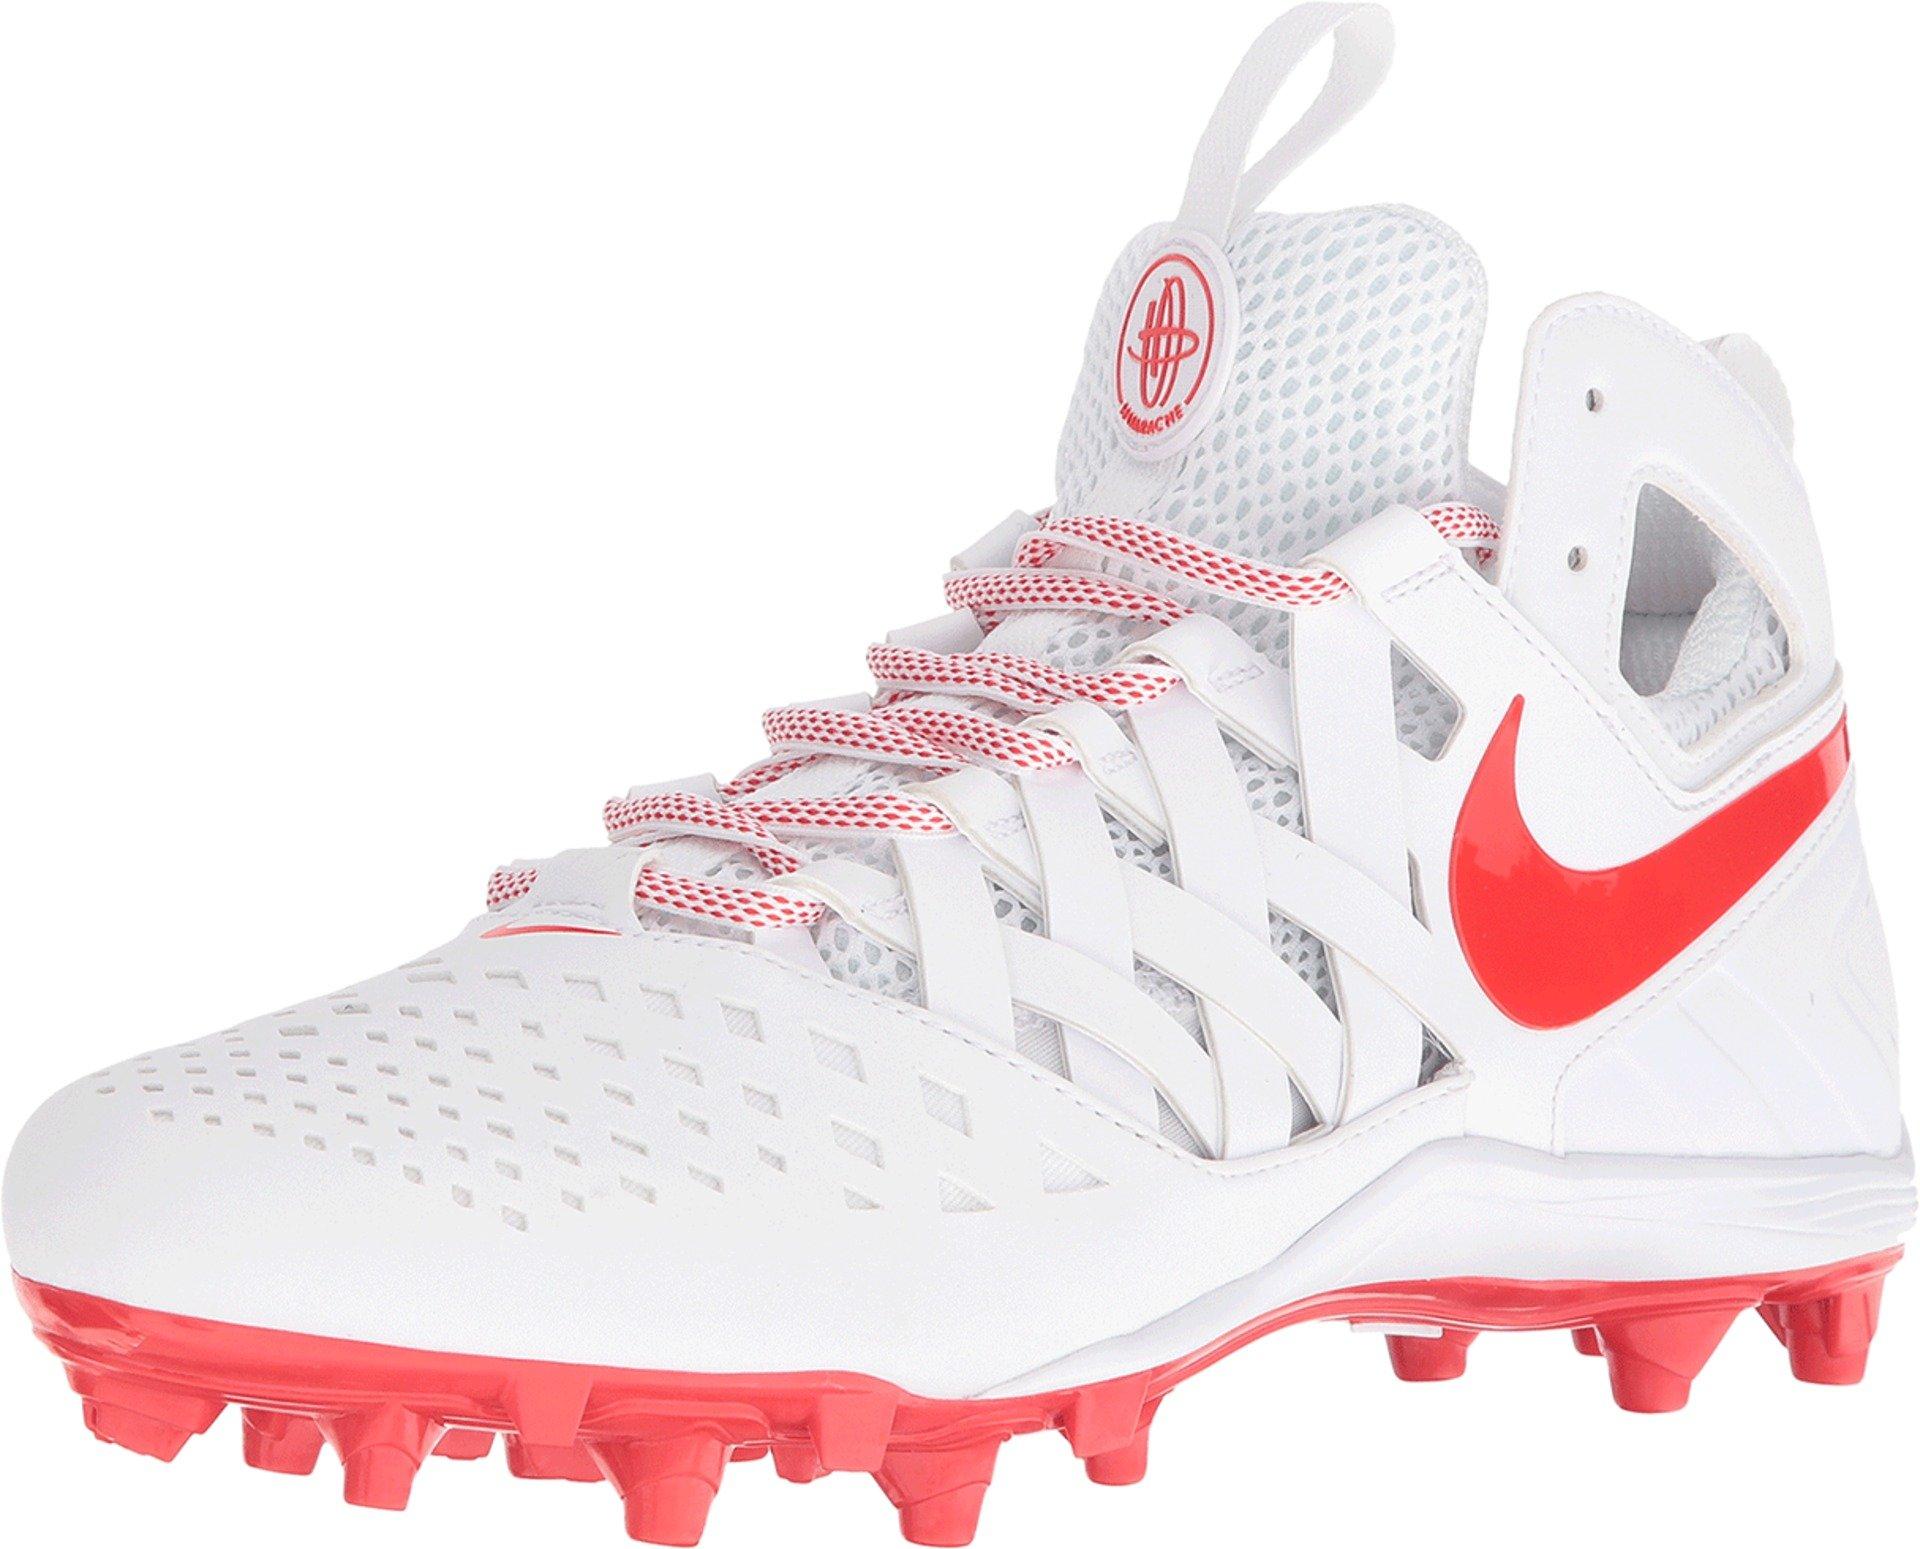 Nike Huarache V Lax White/Light Crimson Men's Cleated Shoes